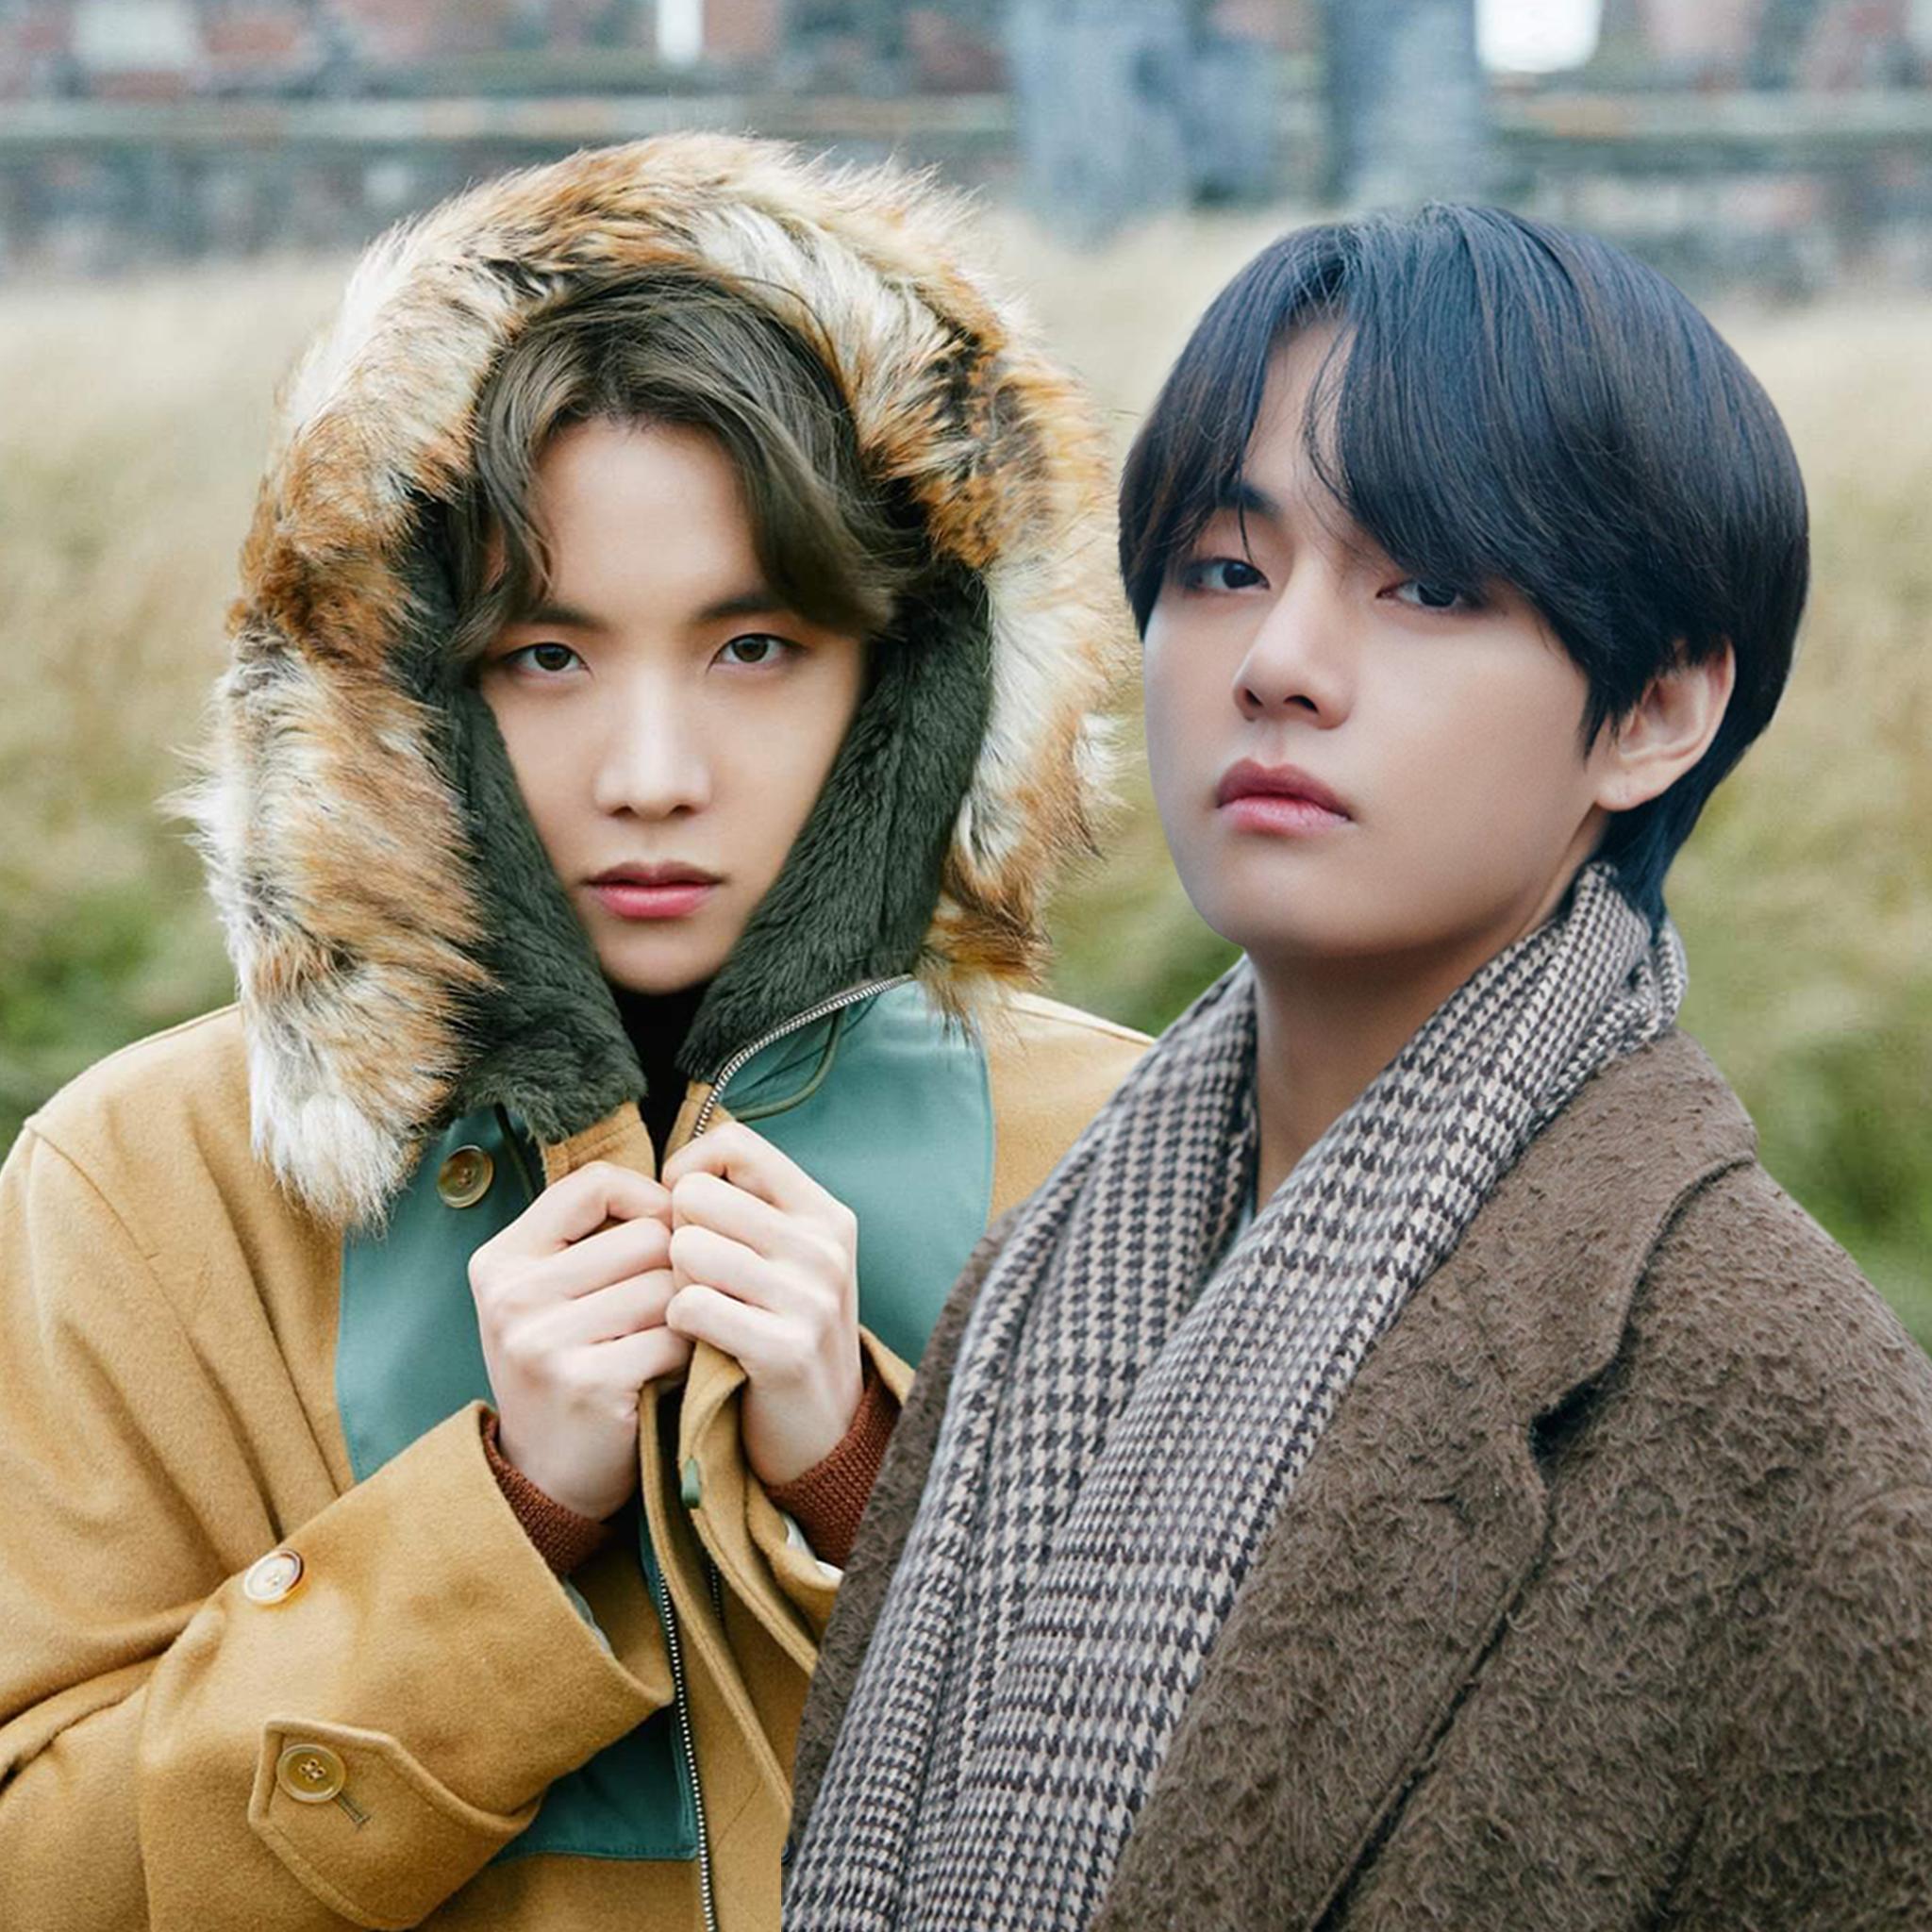 VHOPE 2019 BTS EDIT Foto jimin, Álbuns de fotos, J